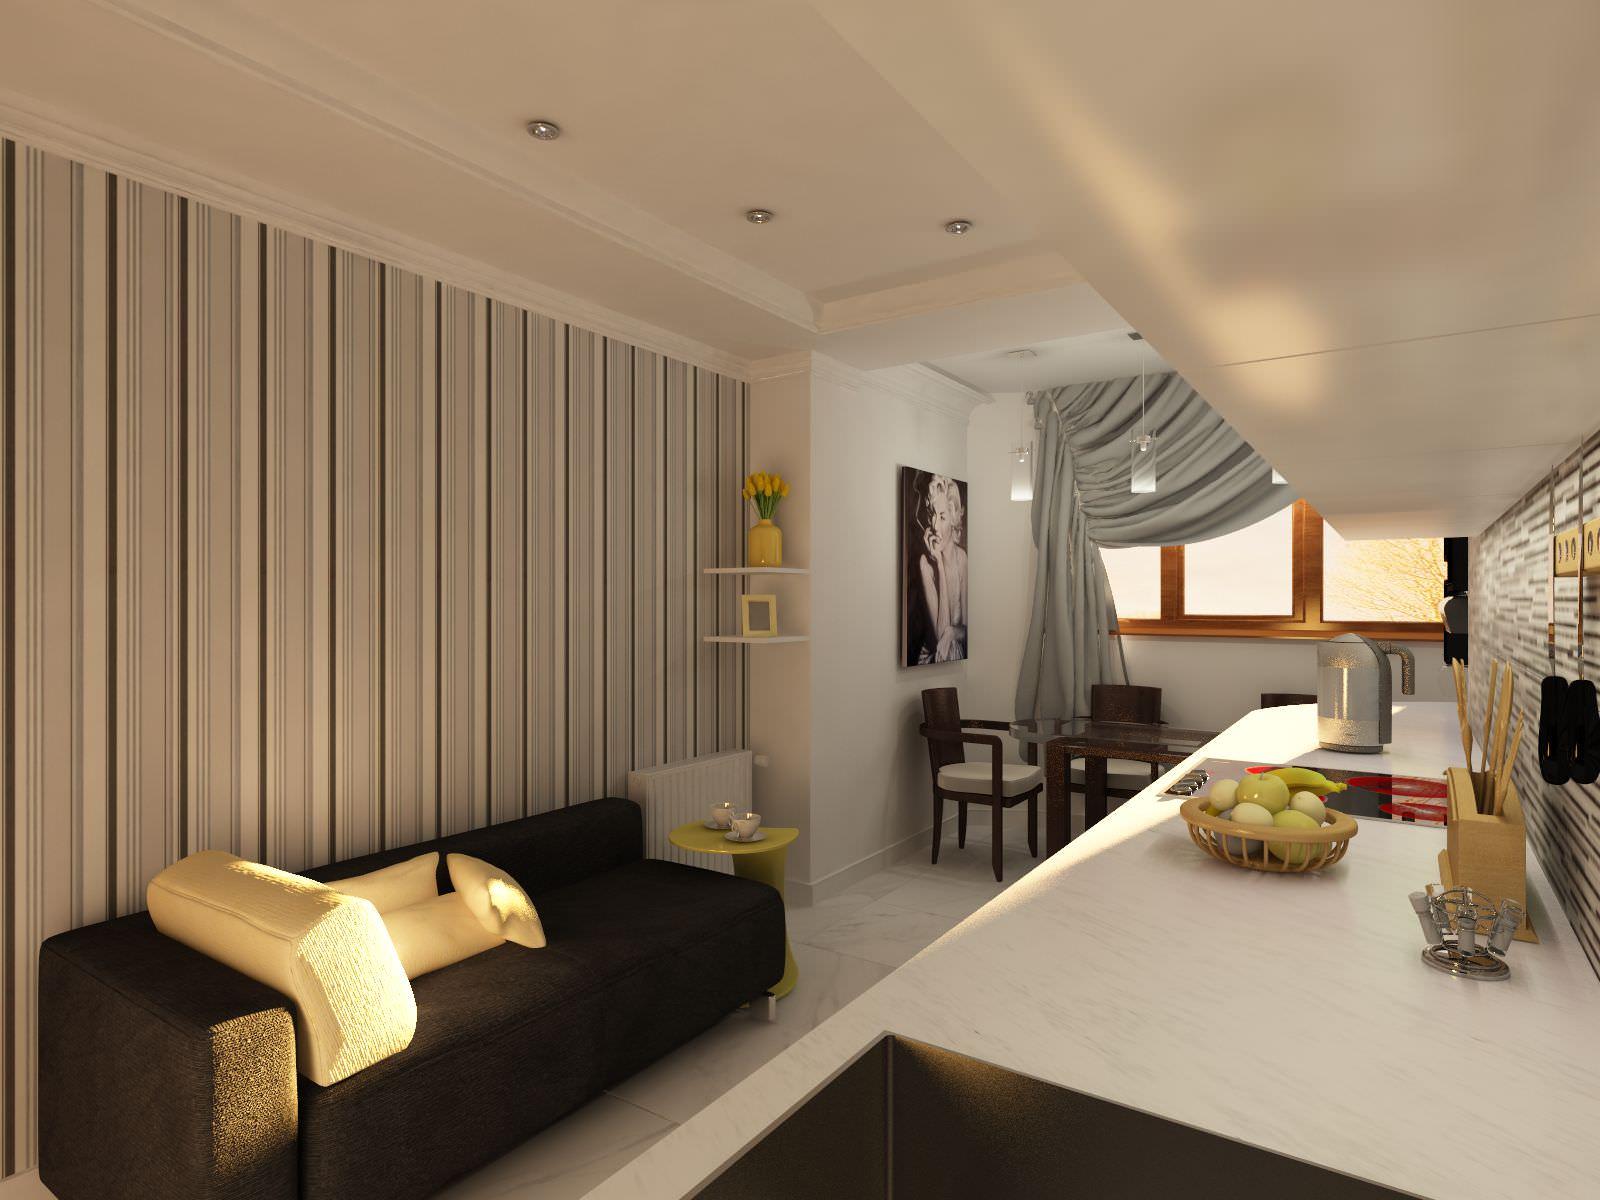 Дизайн комнат с низкими потолками